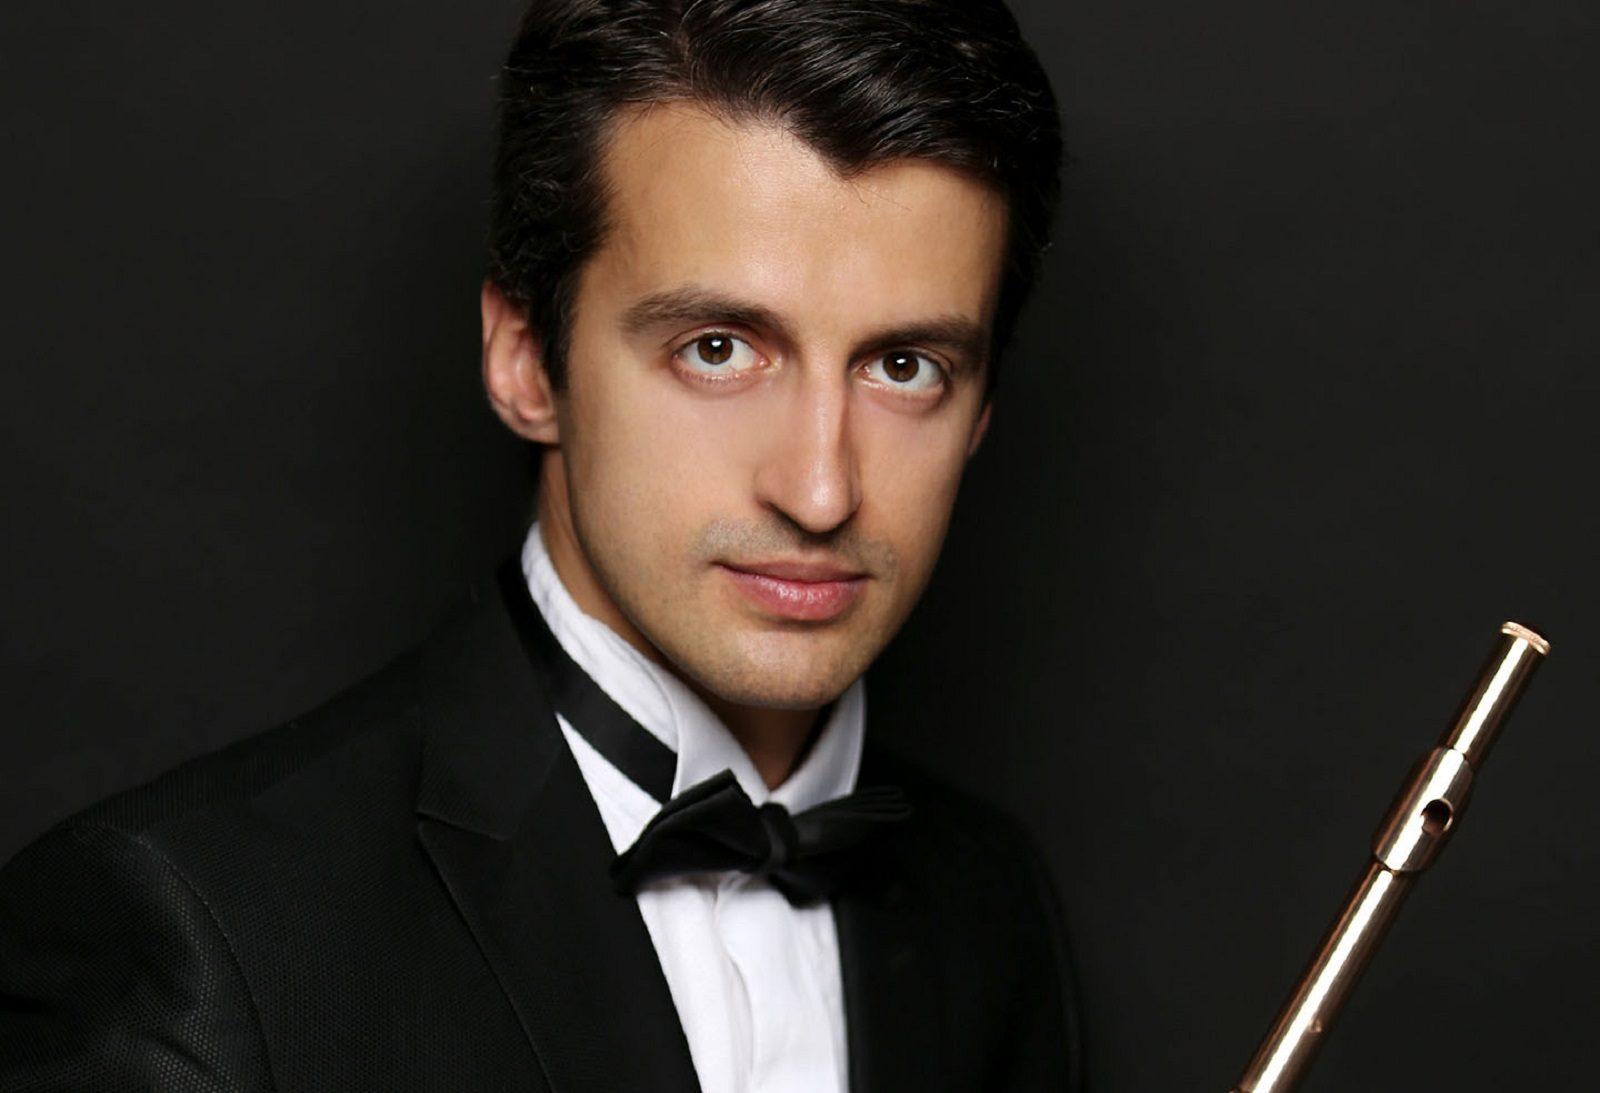 Концерт флейтиста-виртуоза Алексея Морозова в Музее Скрябина – события на сайте «Московские Сезоны»